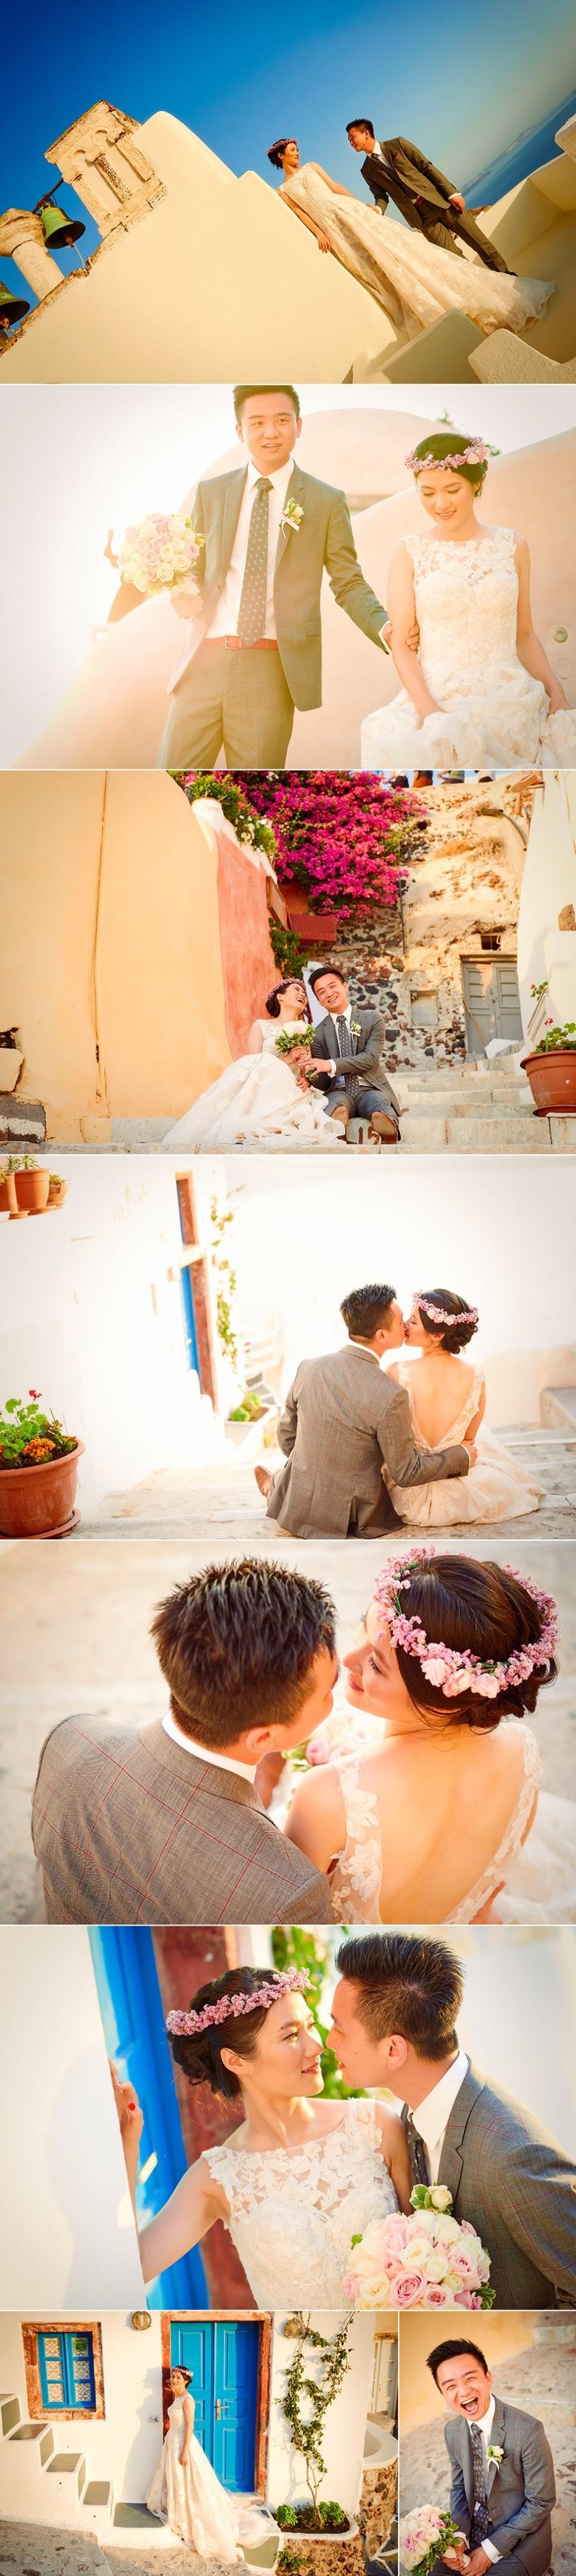 Omi Lili wedding photo07